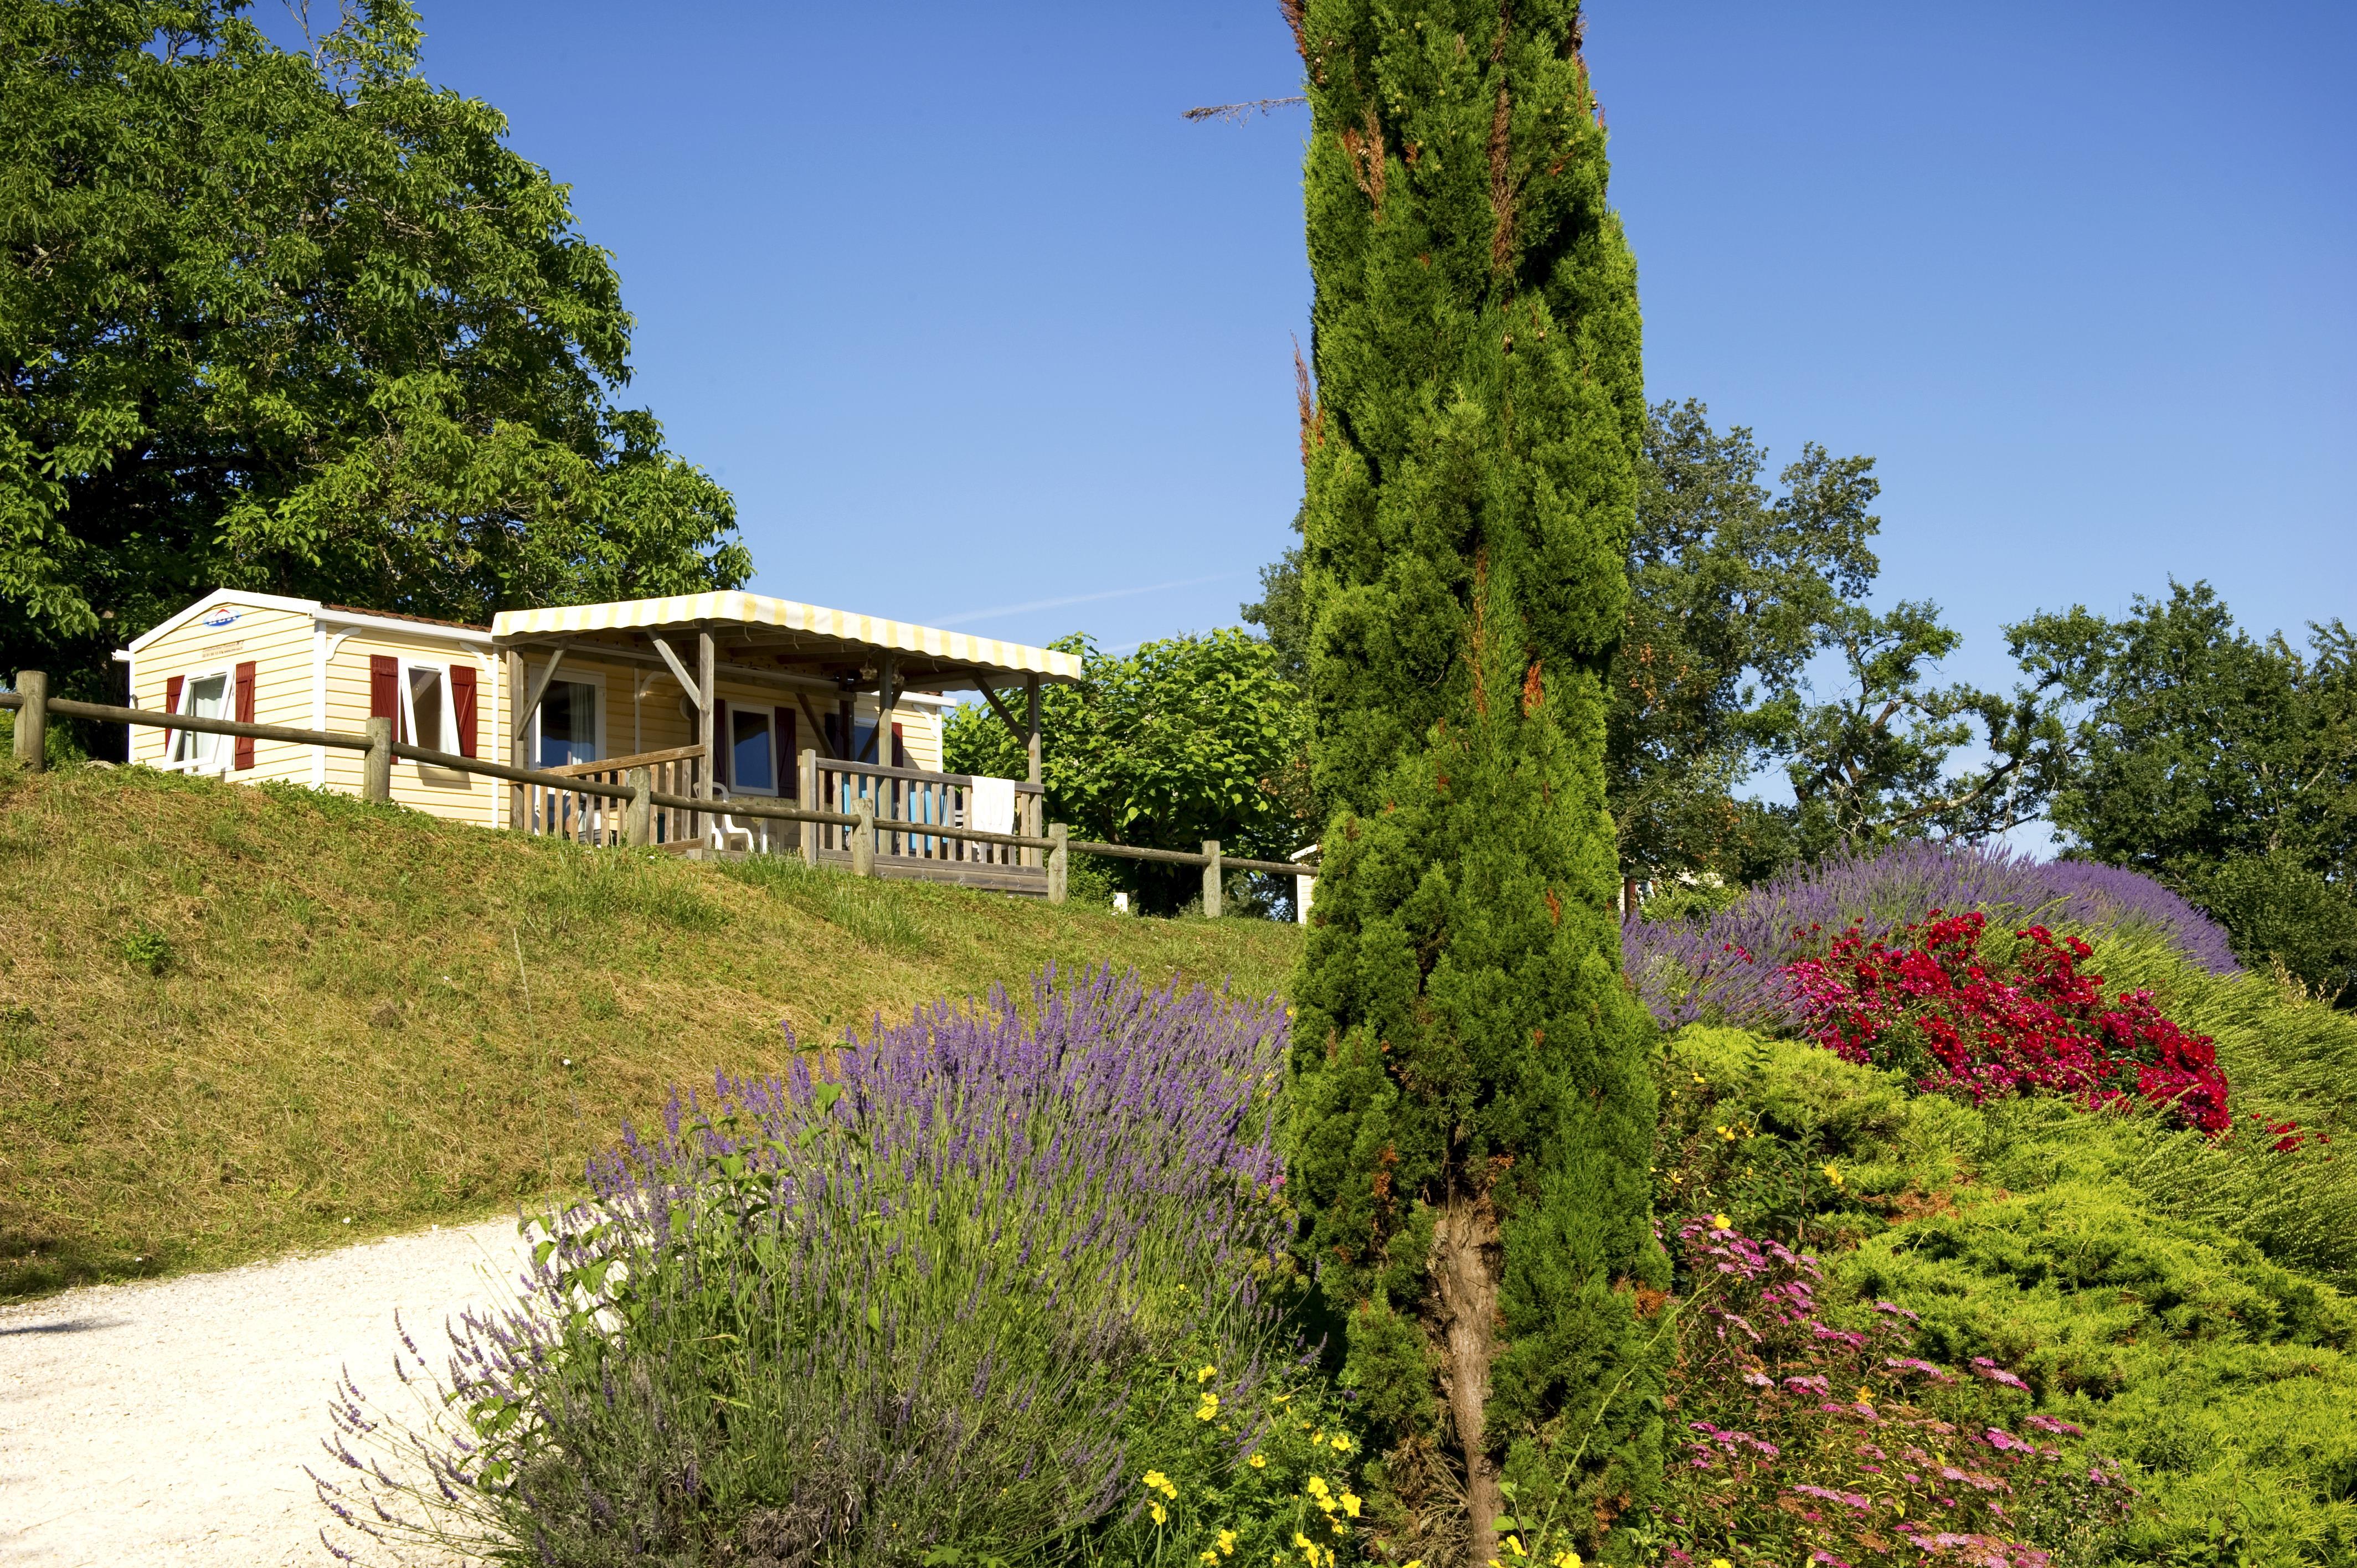 Camping les Terrasses du Perigord, Proissans, Dordogne